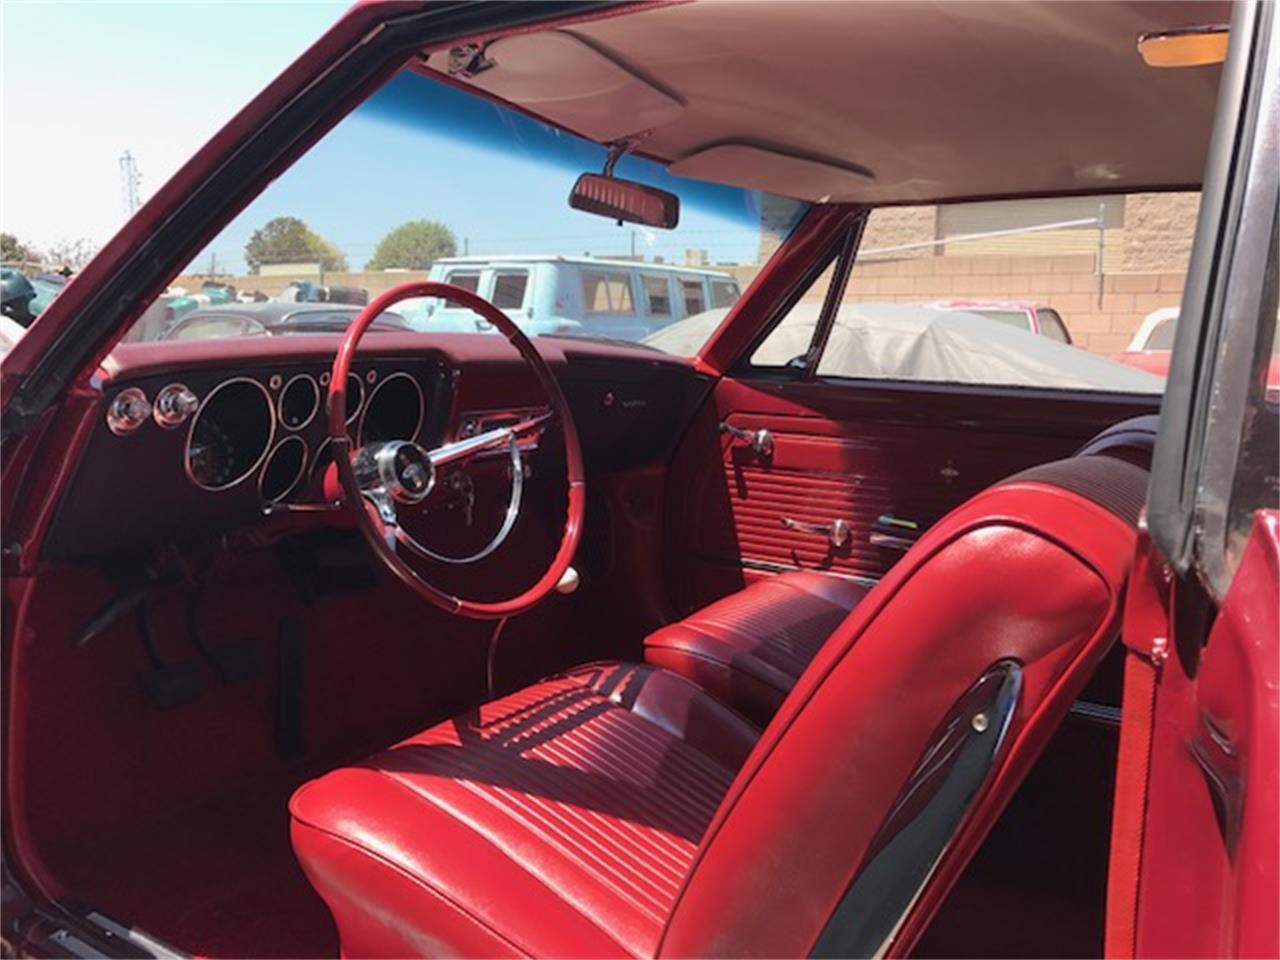 1965 Chevrolet Corvair (CC-1225553) for sale in Springville, California